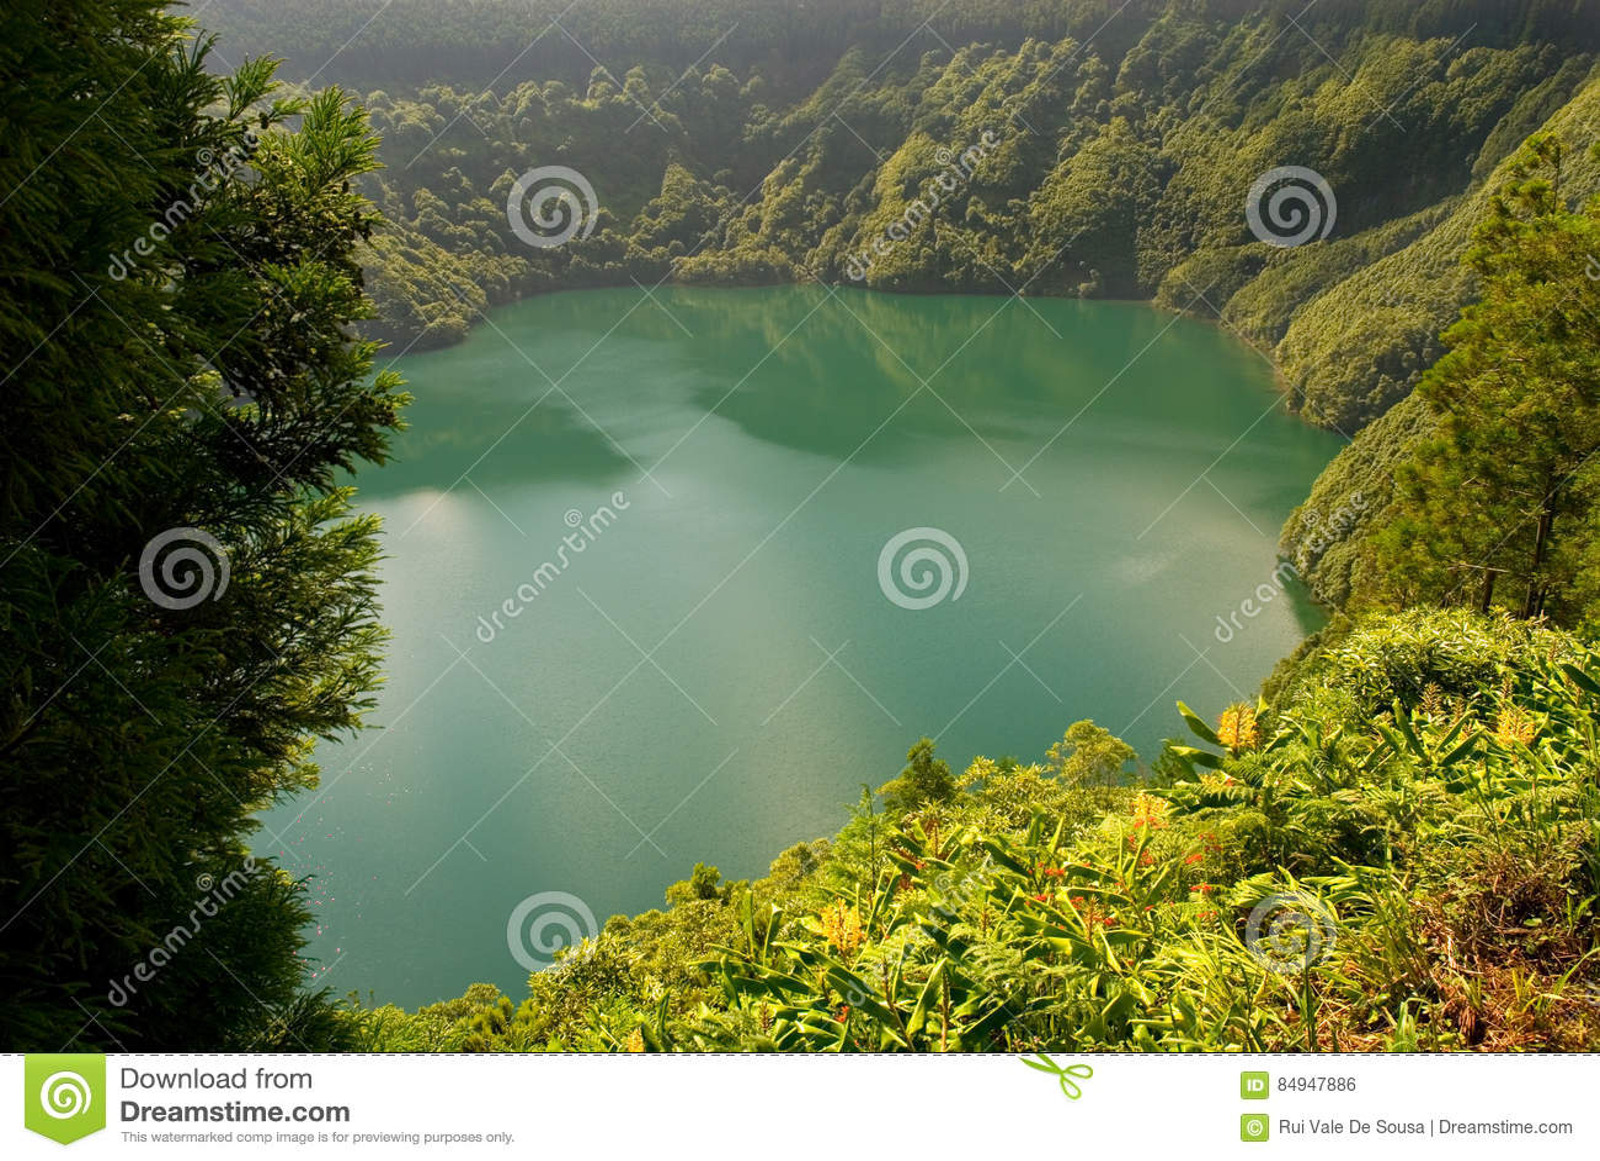 Santiago lake